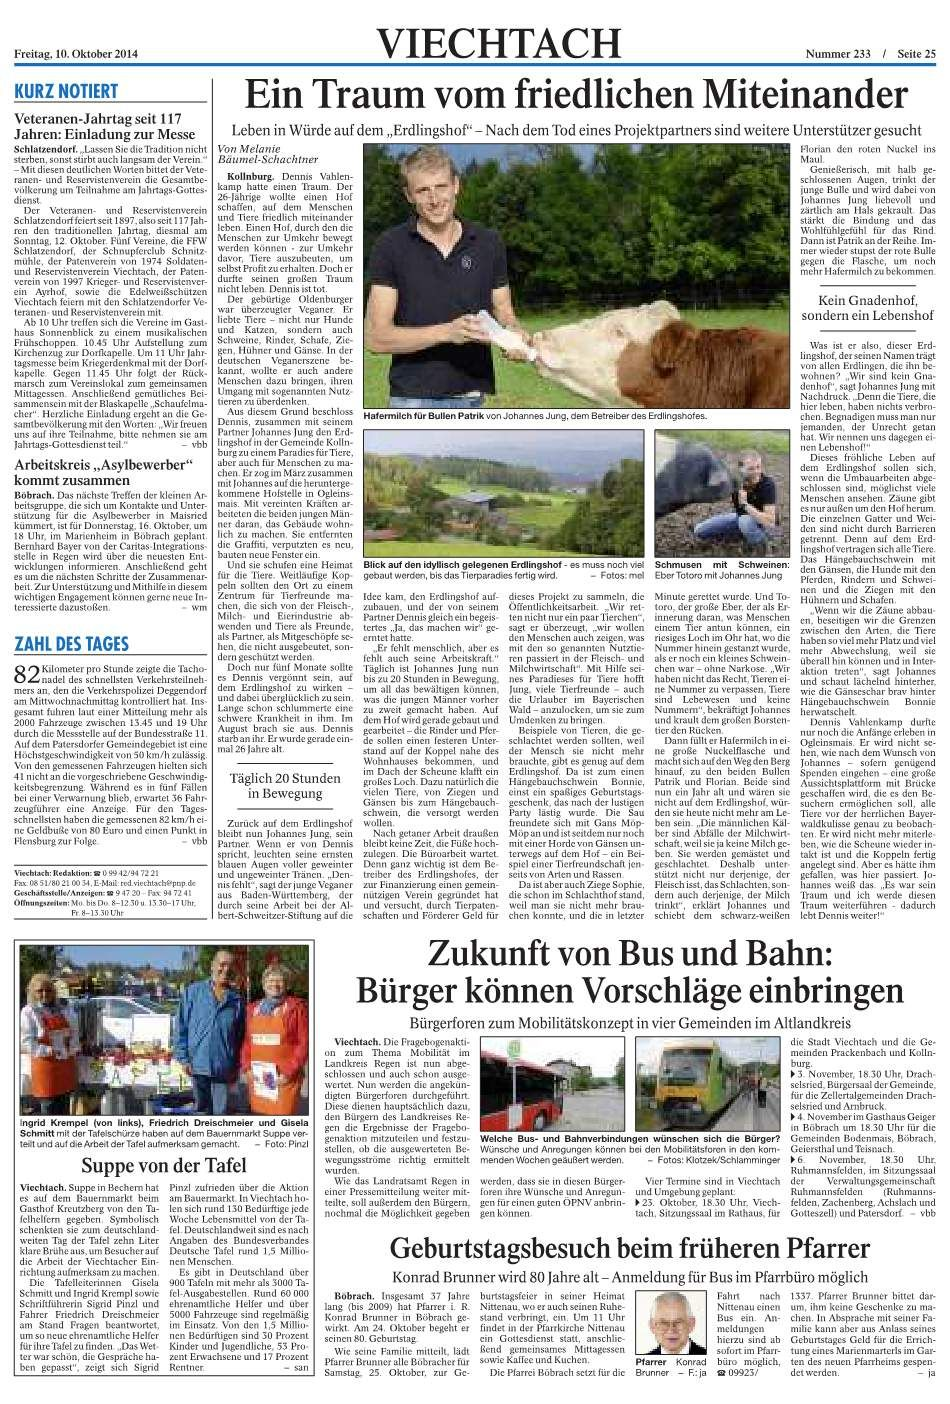 Viechtacher Bayernwald Bote 10.10.2014-p2